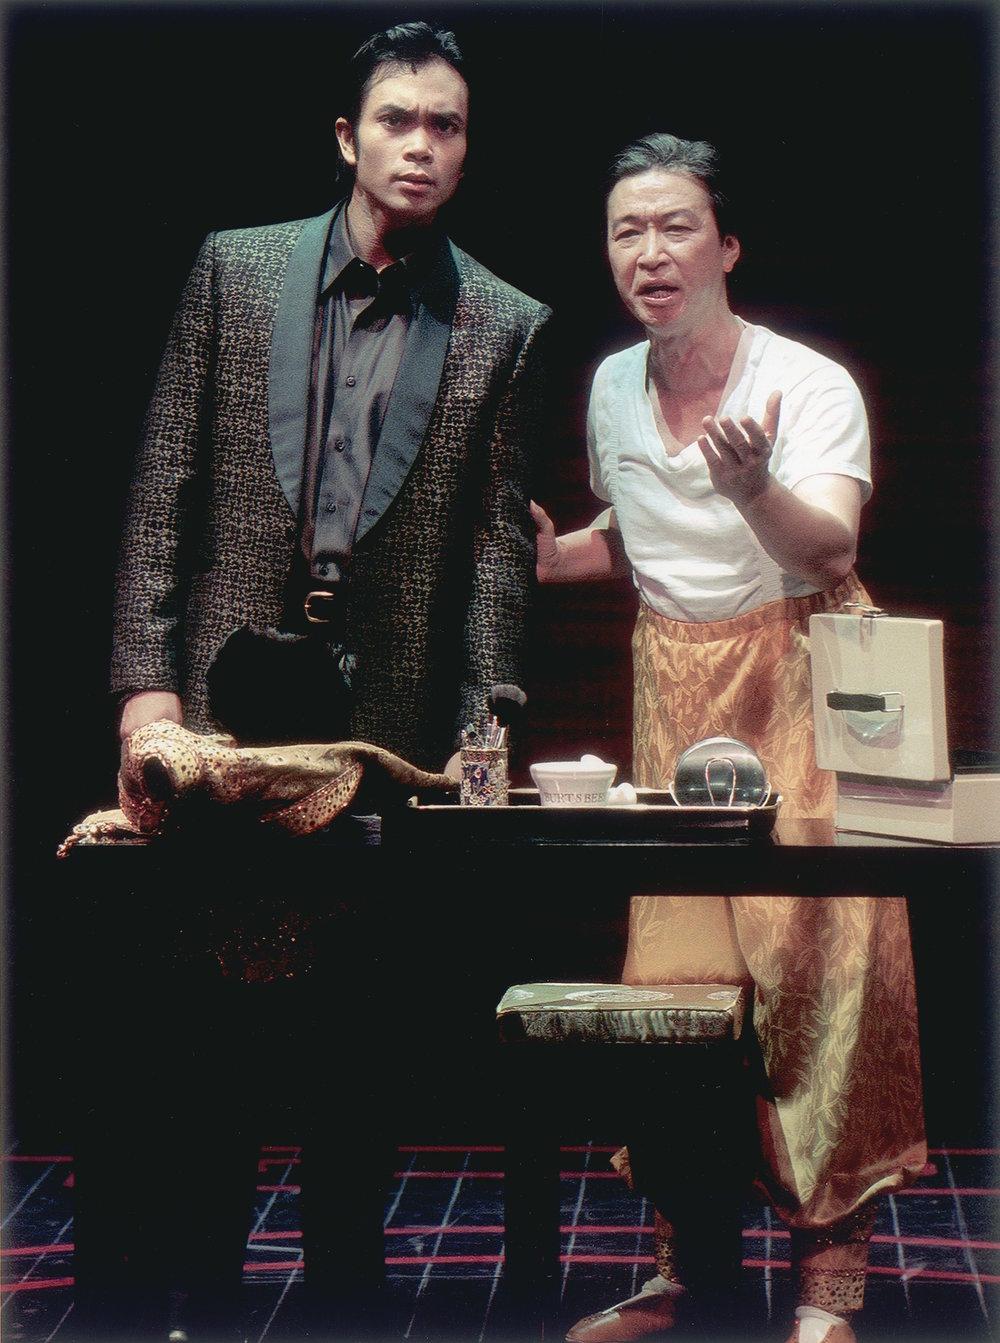 Jose Llana和 Tzi Ma(马泰)。剧照由Craig Schwartz于2001年为马克泰博论坛剧院所摄。